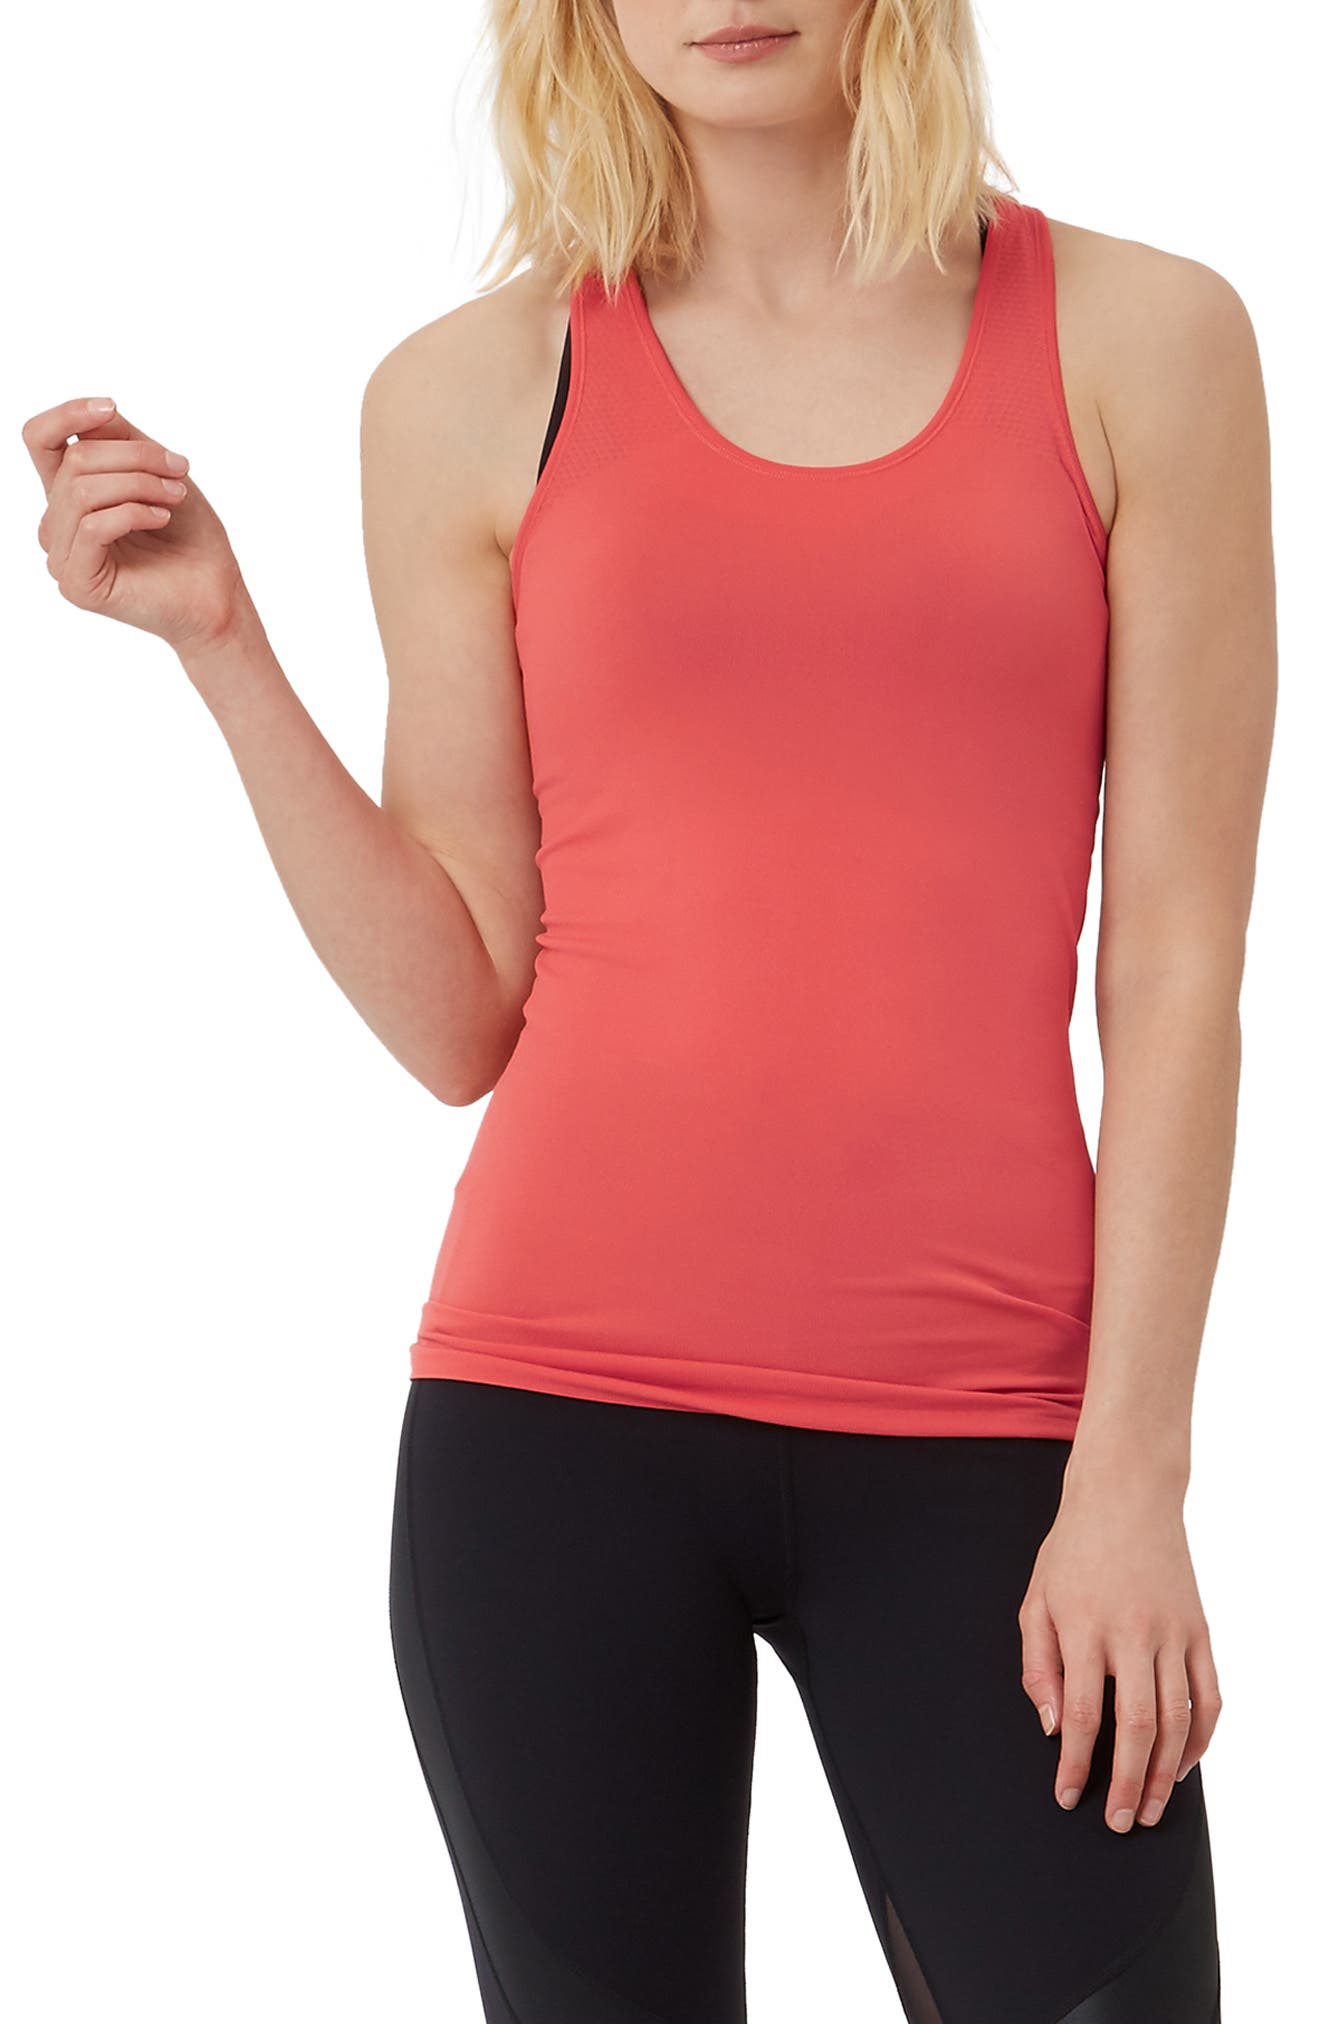 Athlete Seamless Workout Tank,                             Main thumbnail 1, color,                             REBEL RED